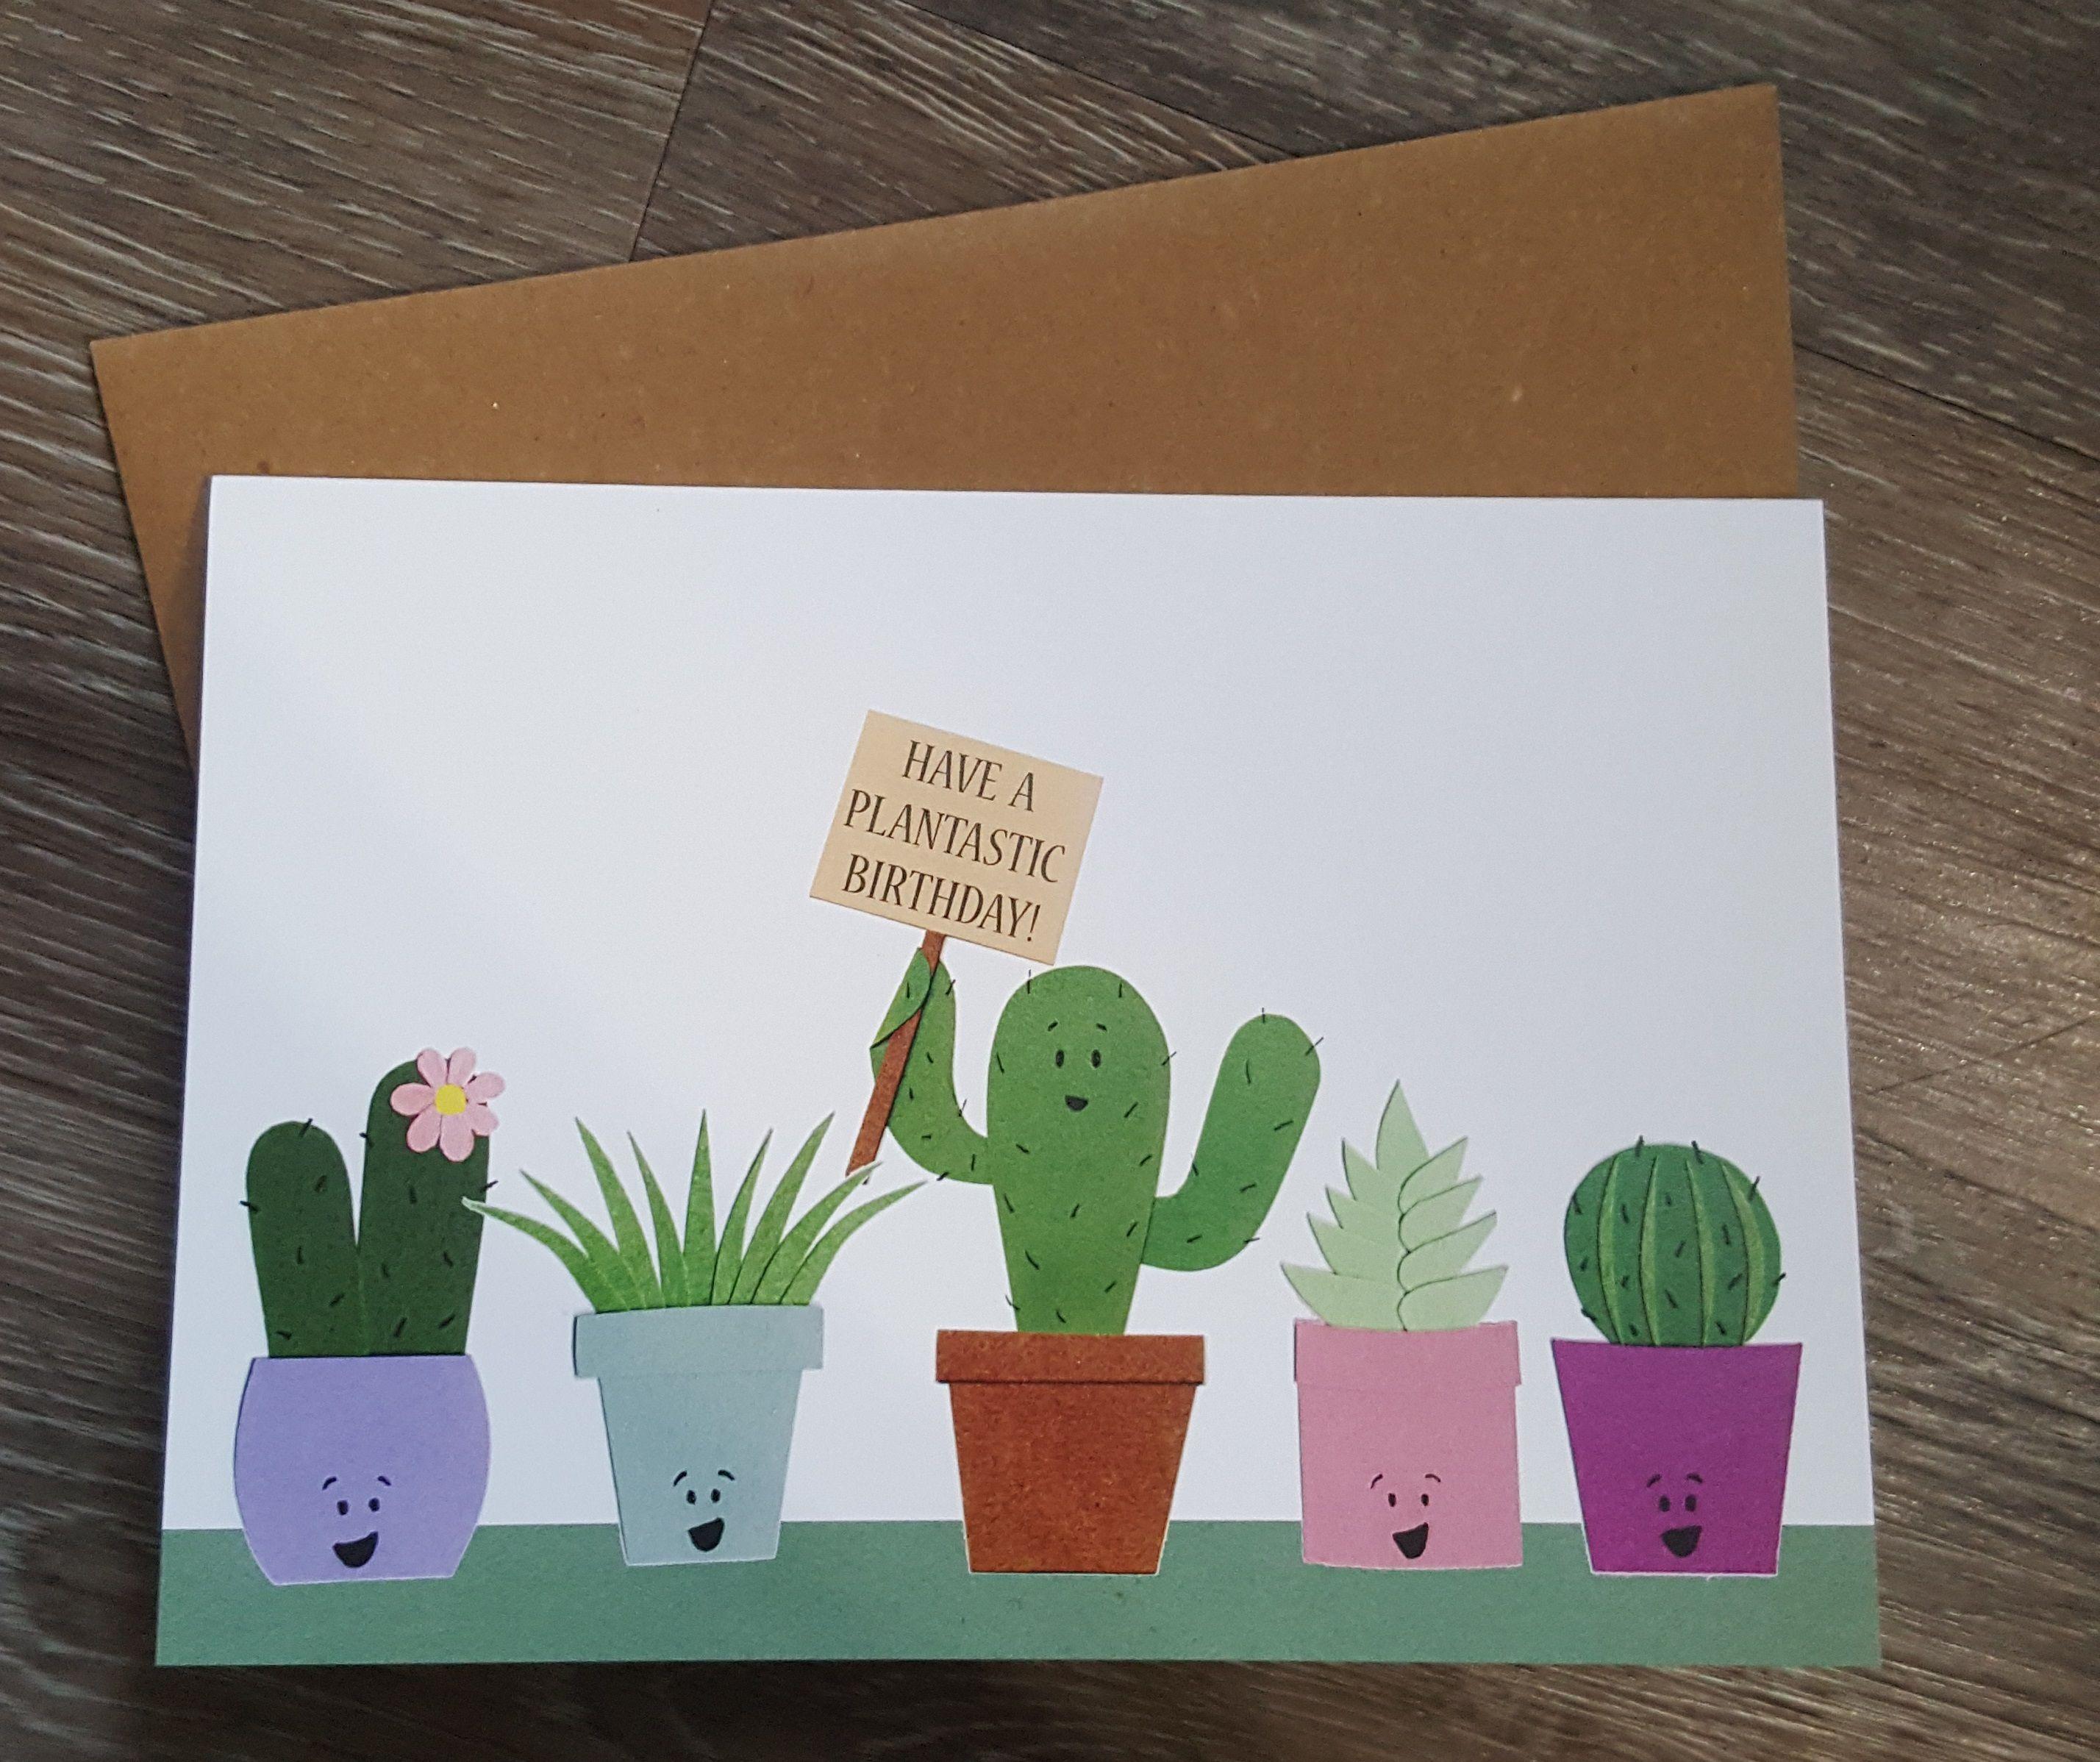 Birthday Greeting Card Happy Birthday Card Funny Birthday Card Cute Card Plant Cards Houseplants Birthday Card For Friend Plants Birthday Cards For Friends Funny Birthday Cards Birthday Card Craft